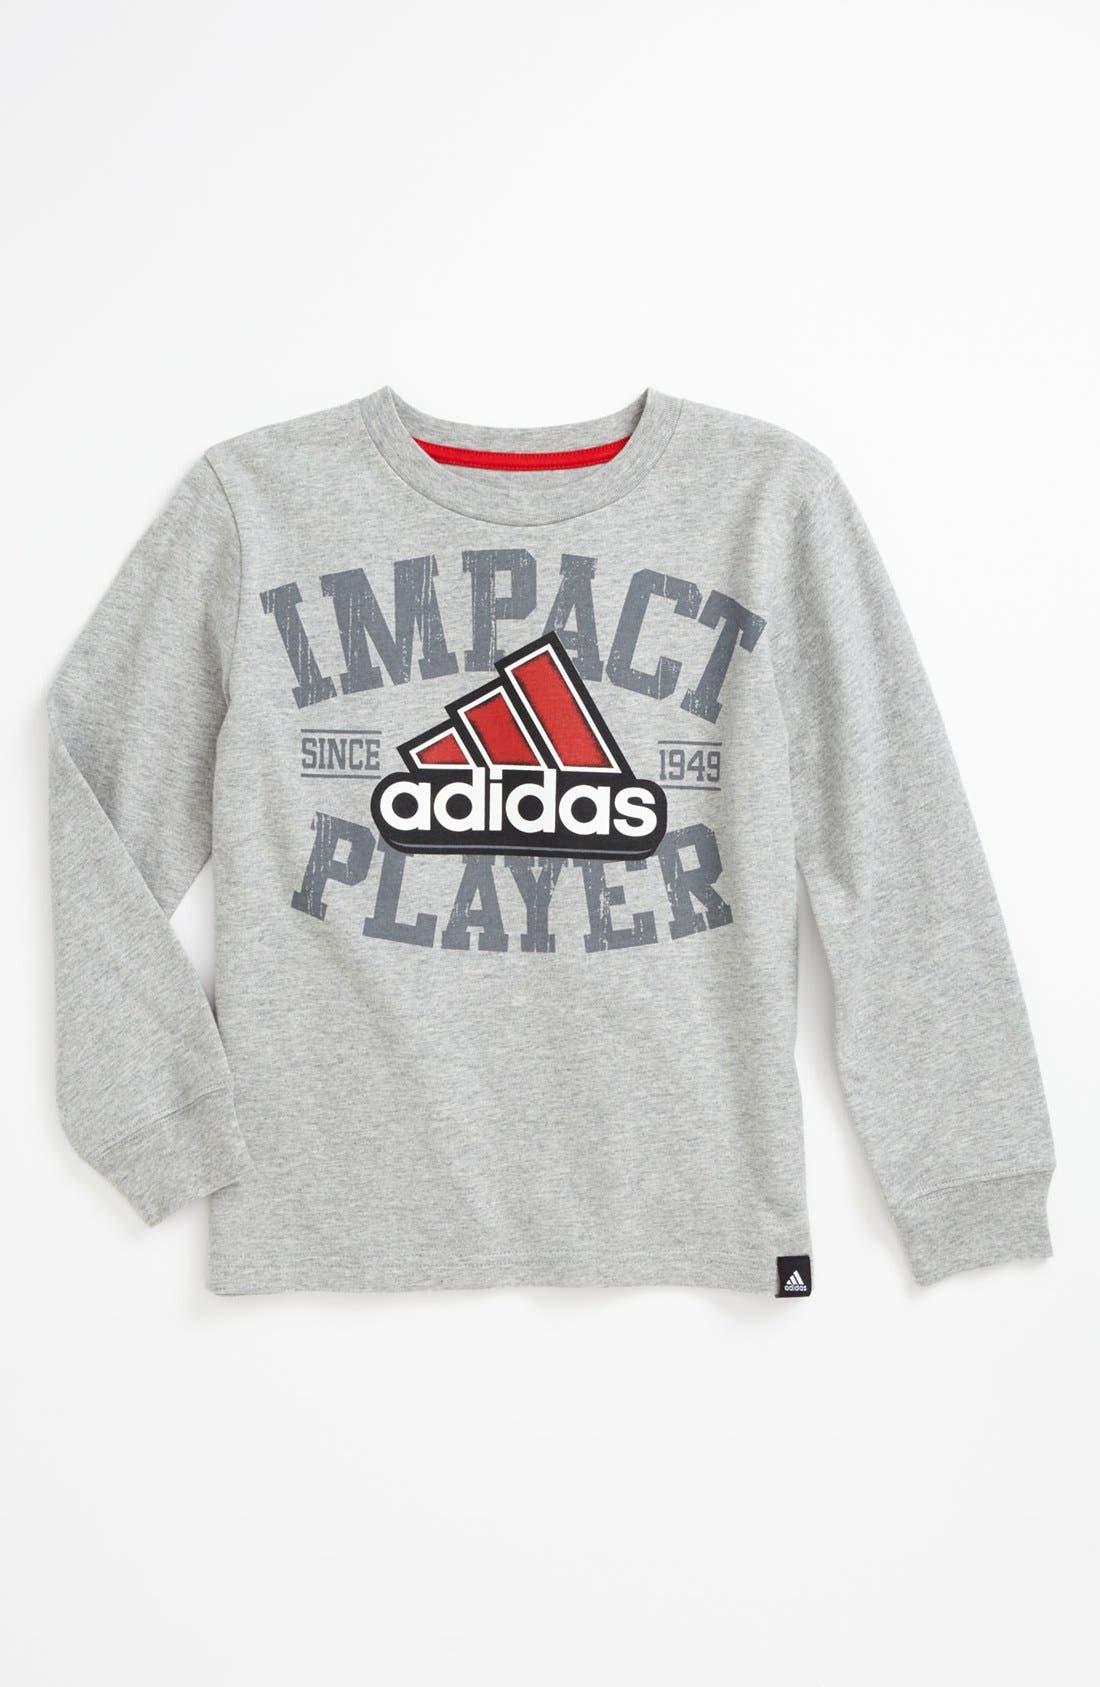 Alternate Image 1 Selected - adidas 'Impact Player' T-Shirt (Little Boys)